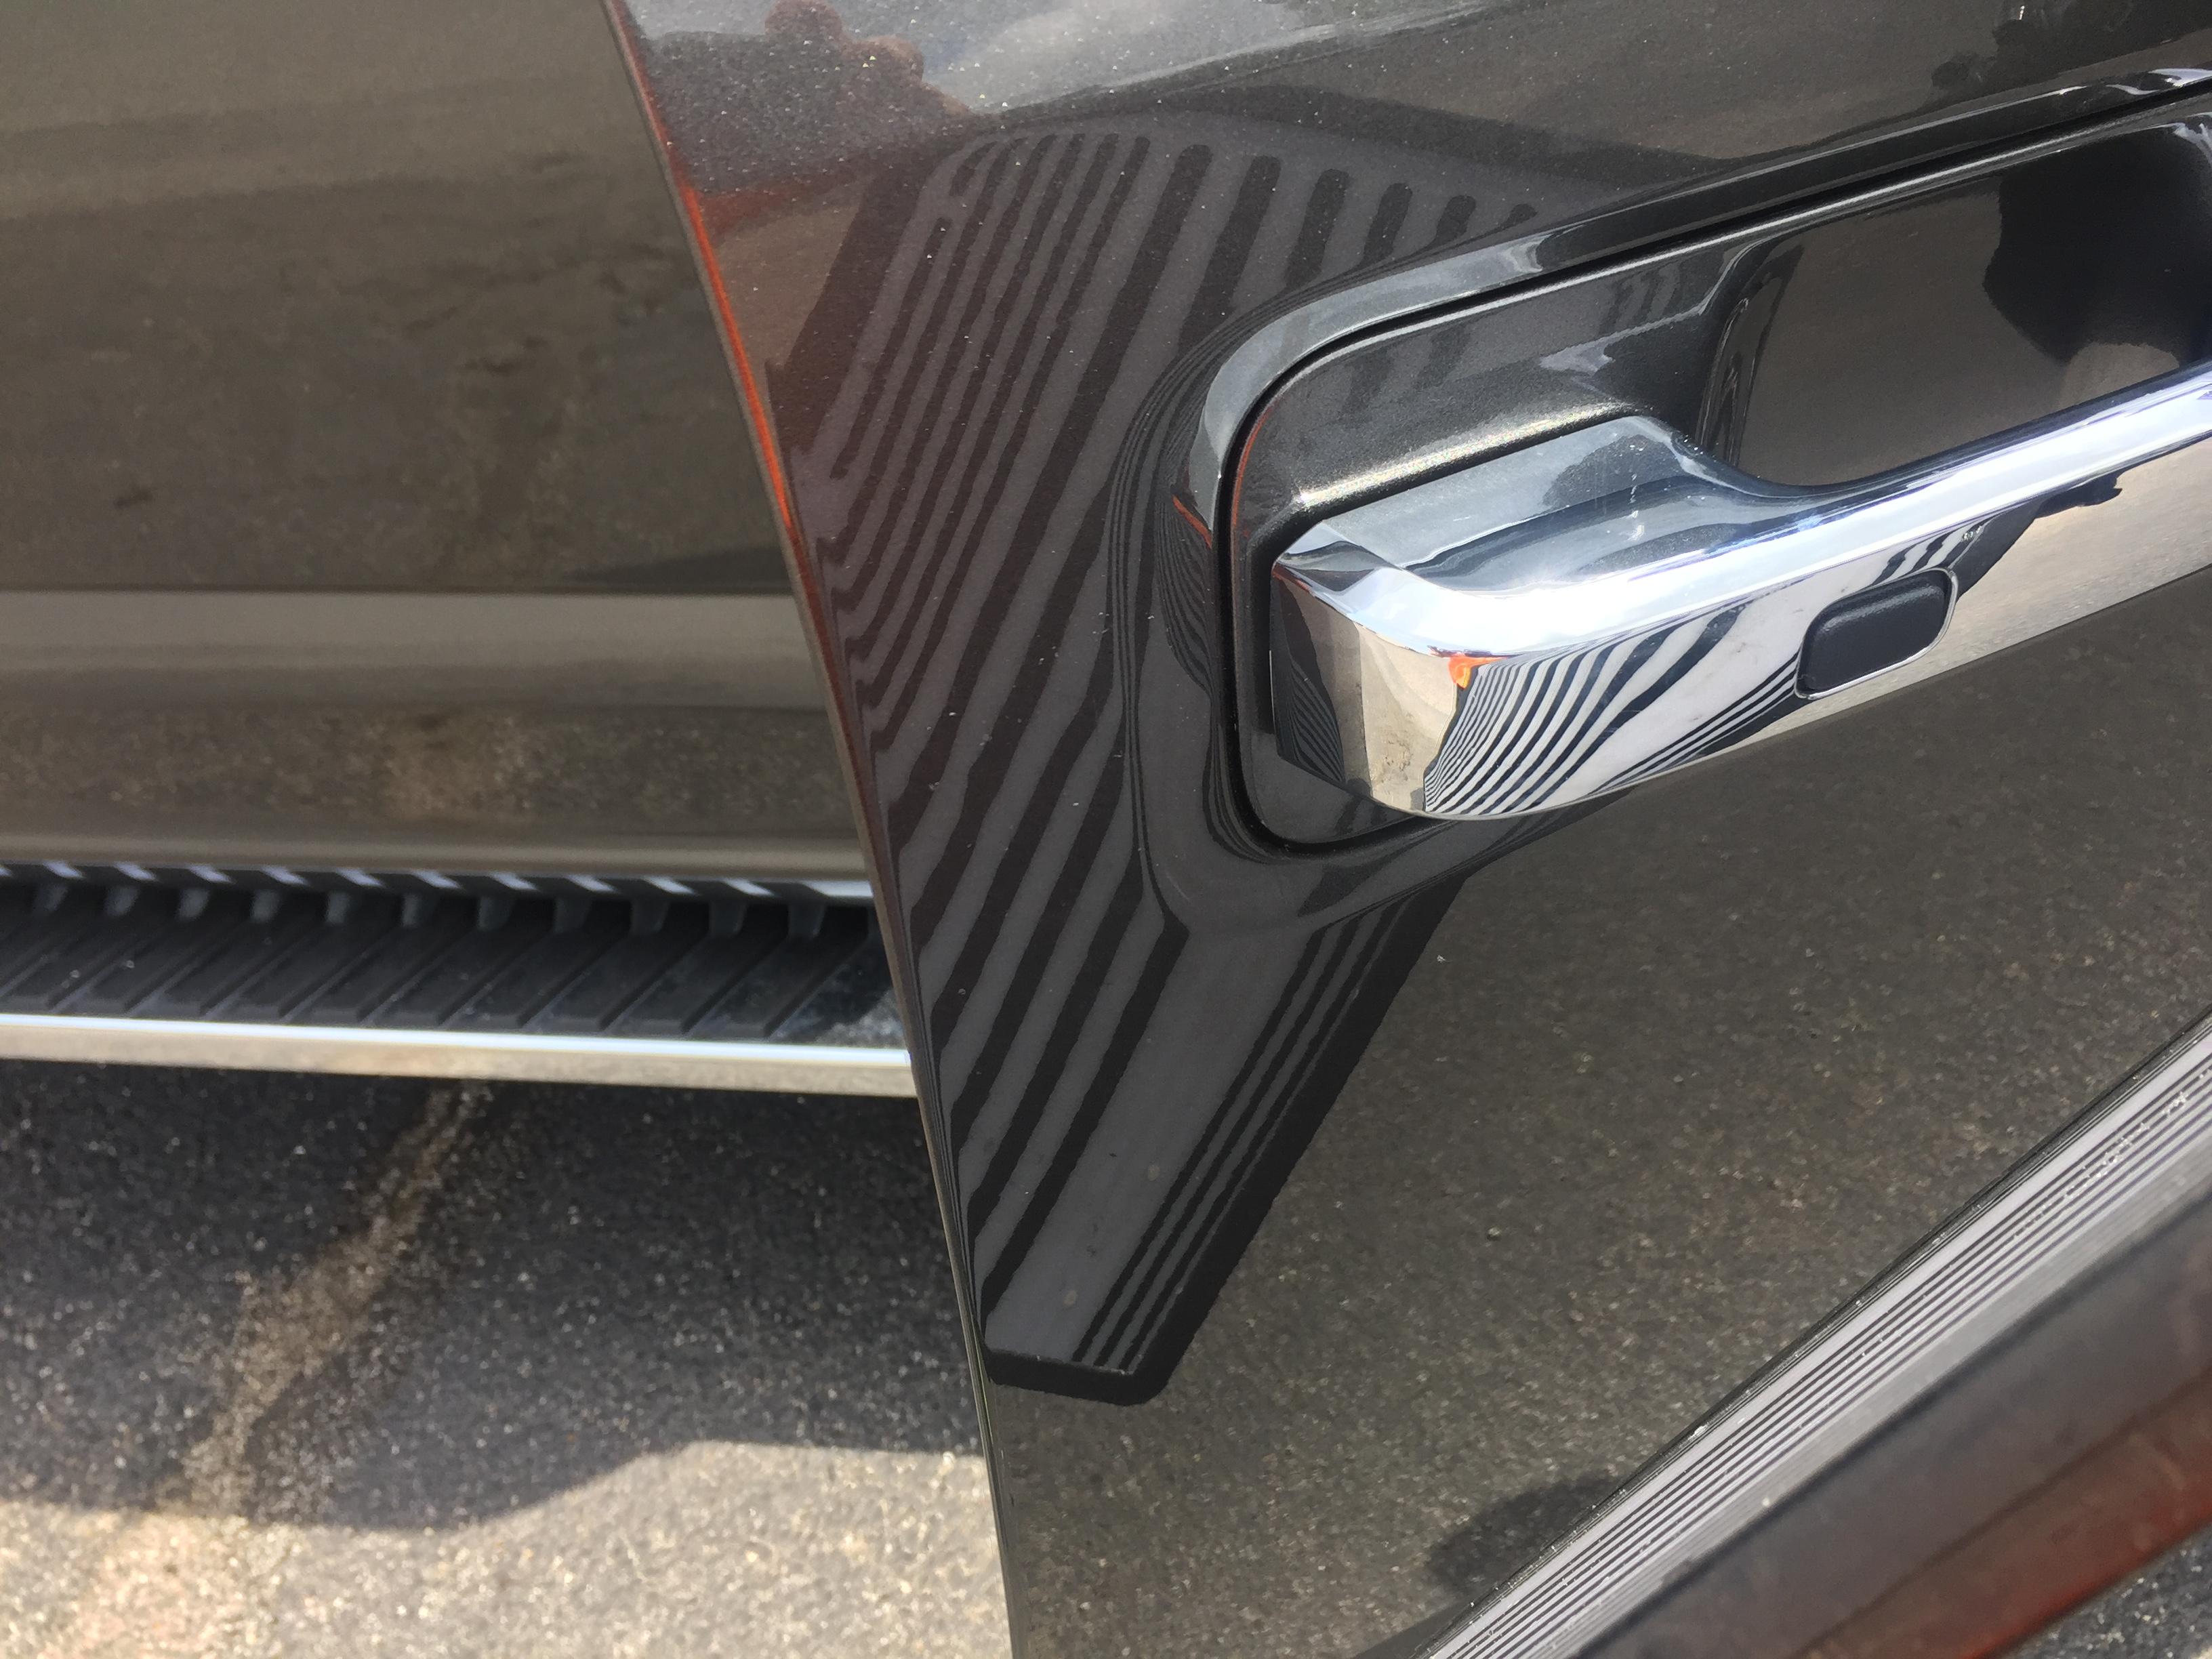 www.217dent.com 2015 Grey Aluminum Ford F-150 passenger side door dent removal near door-handle.